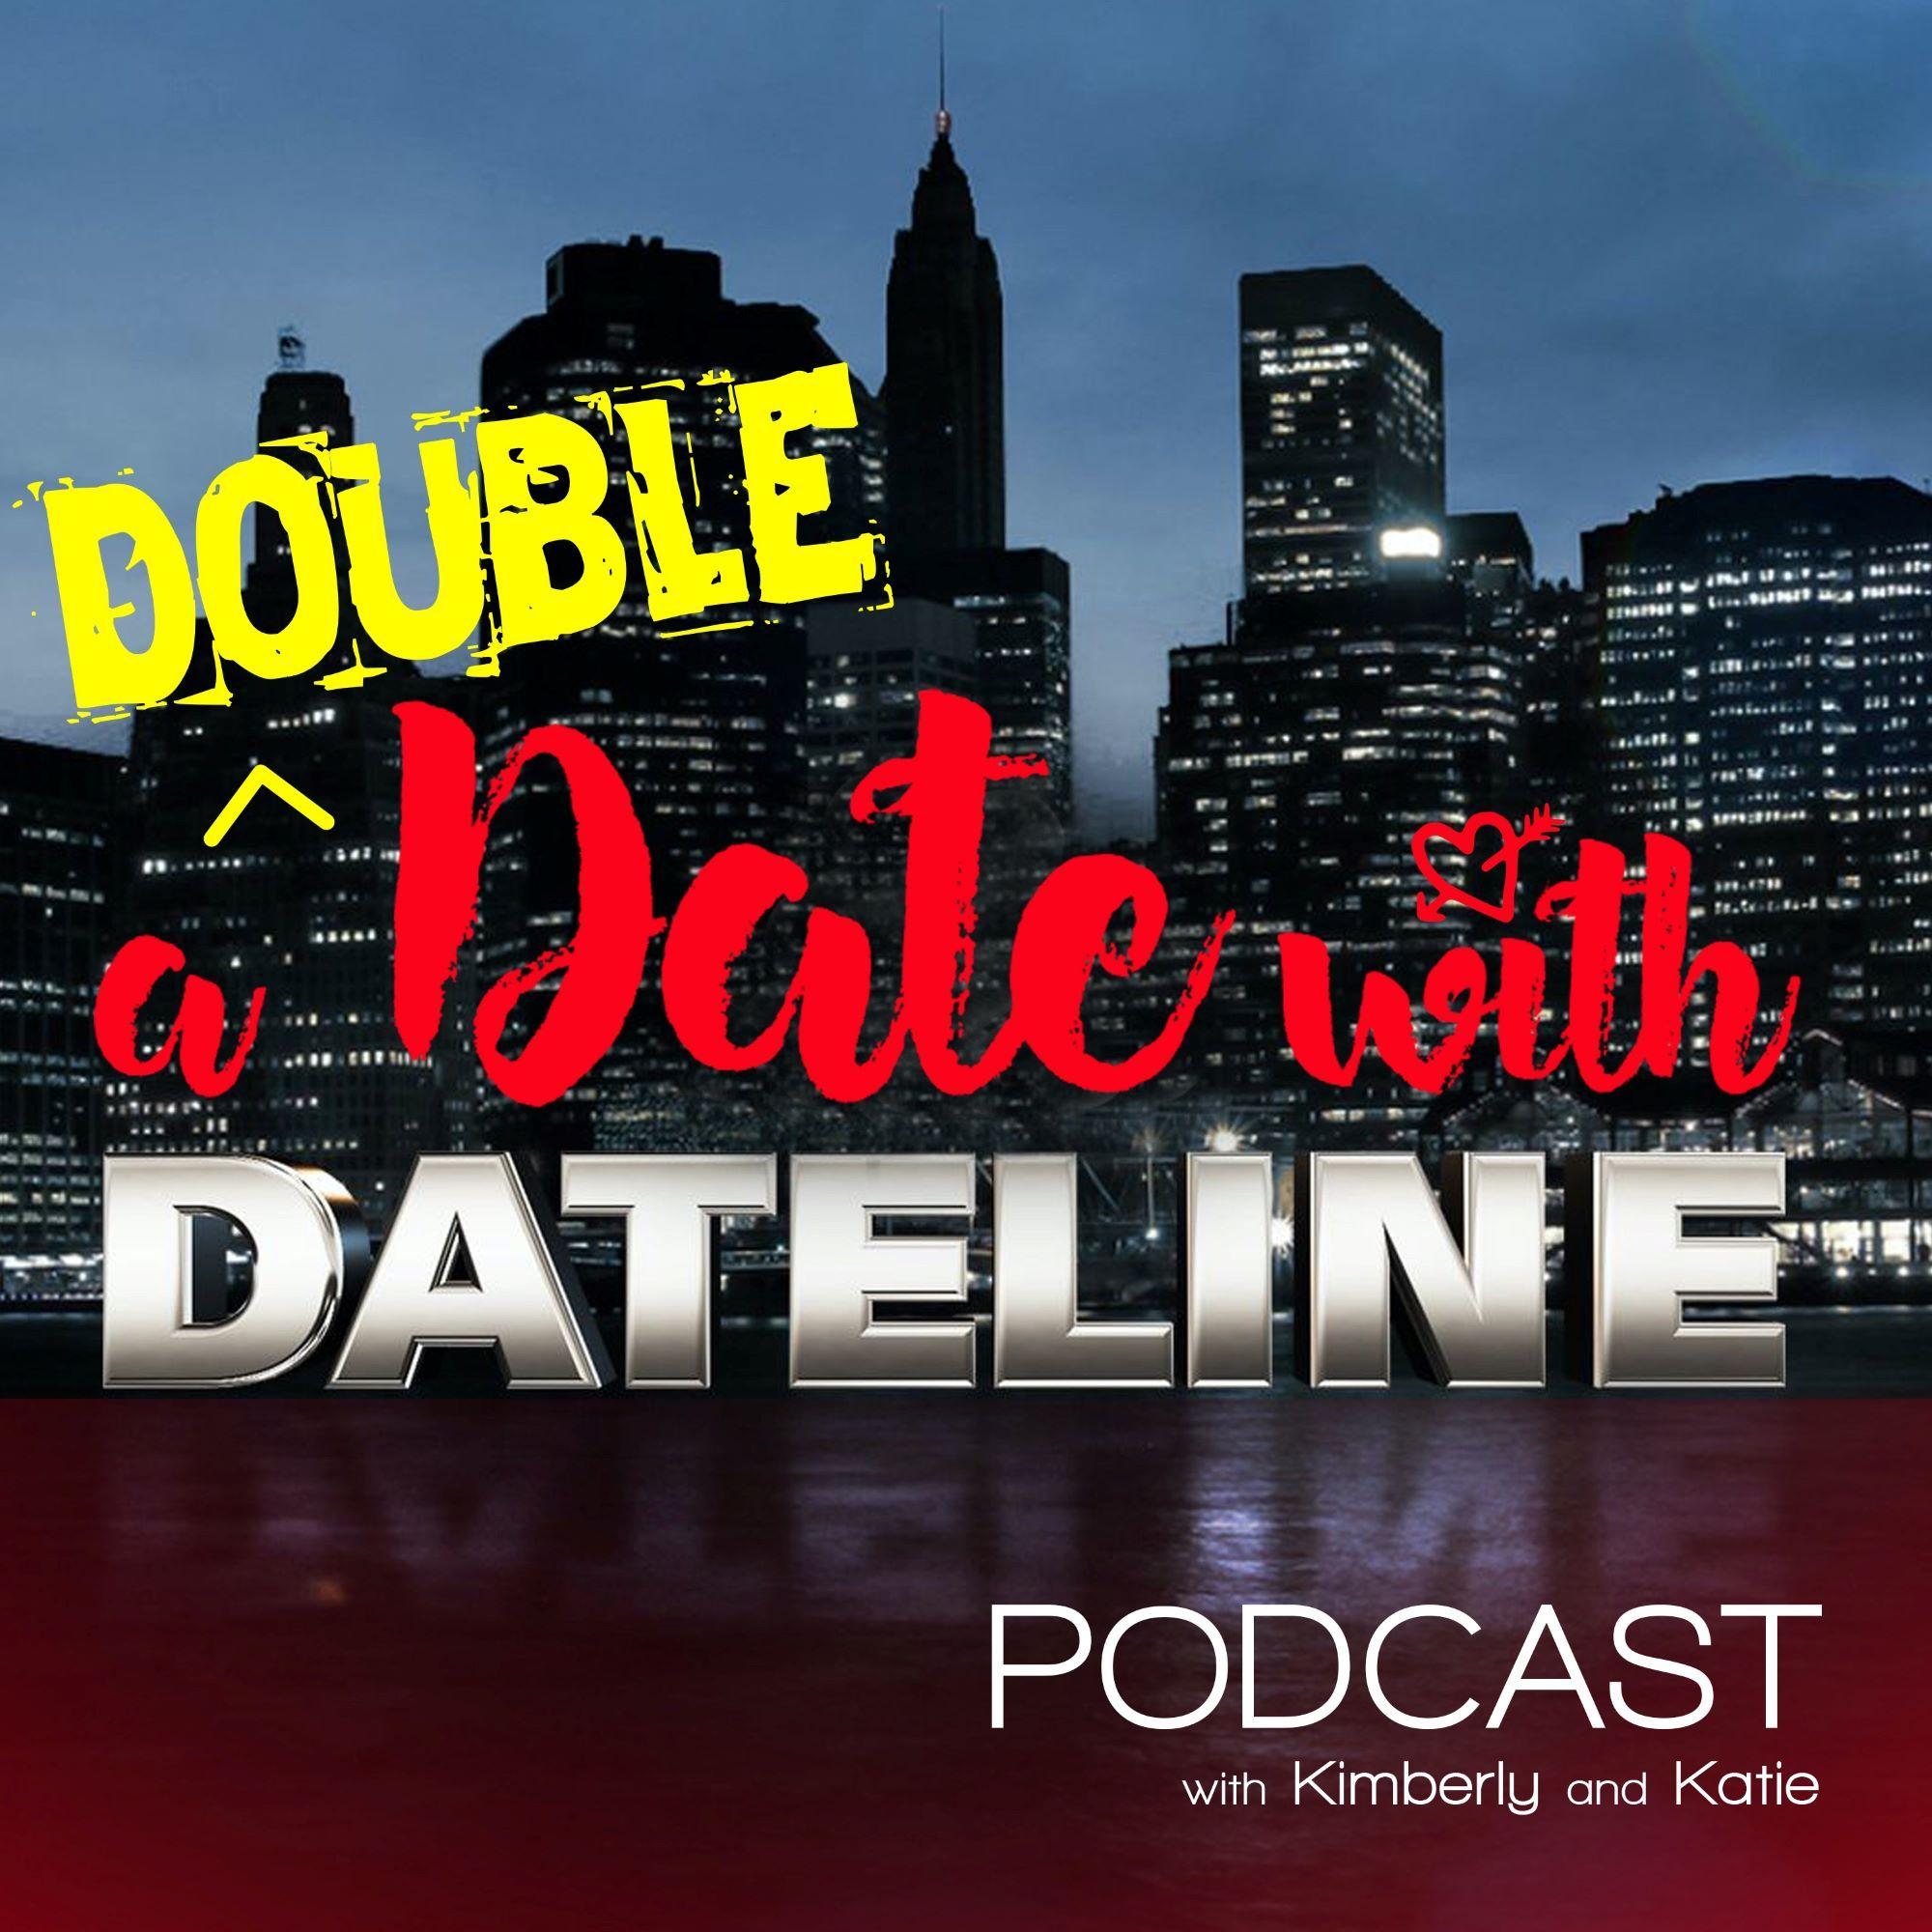 Double Date: Betrayed S.4 Ep.7 -Unholy Alliances